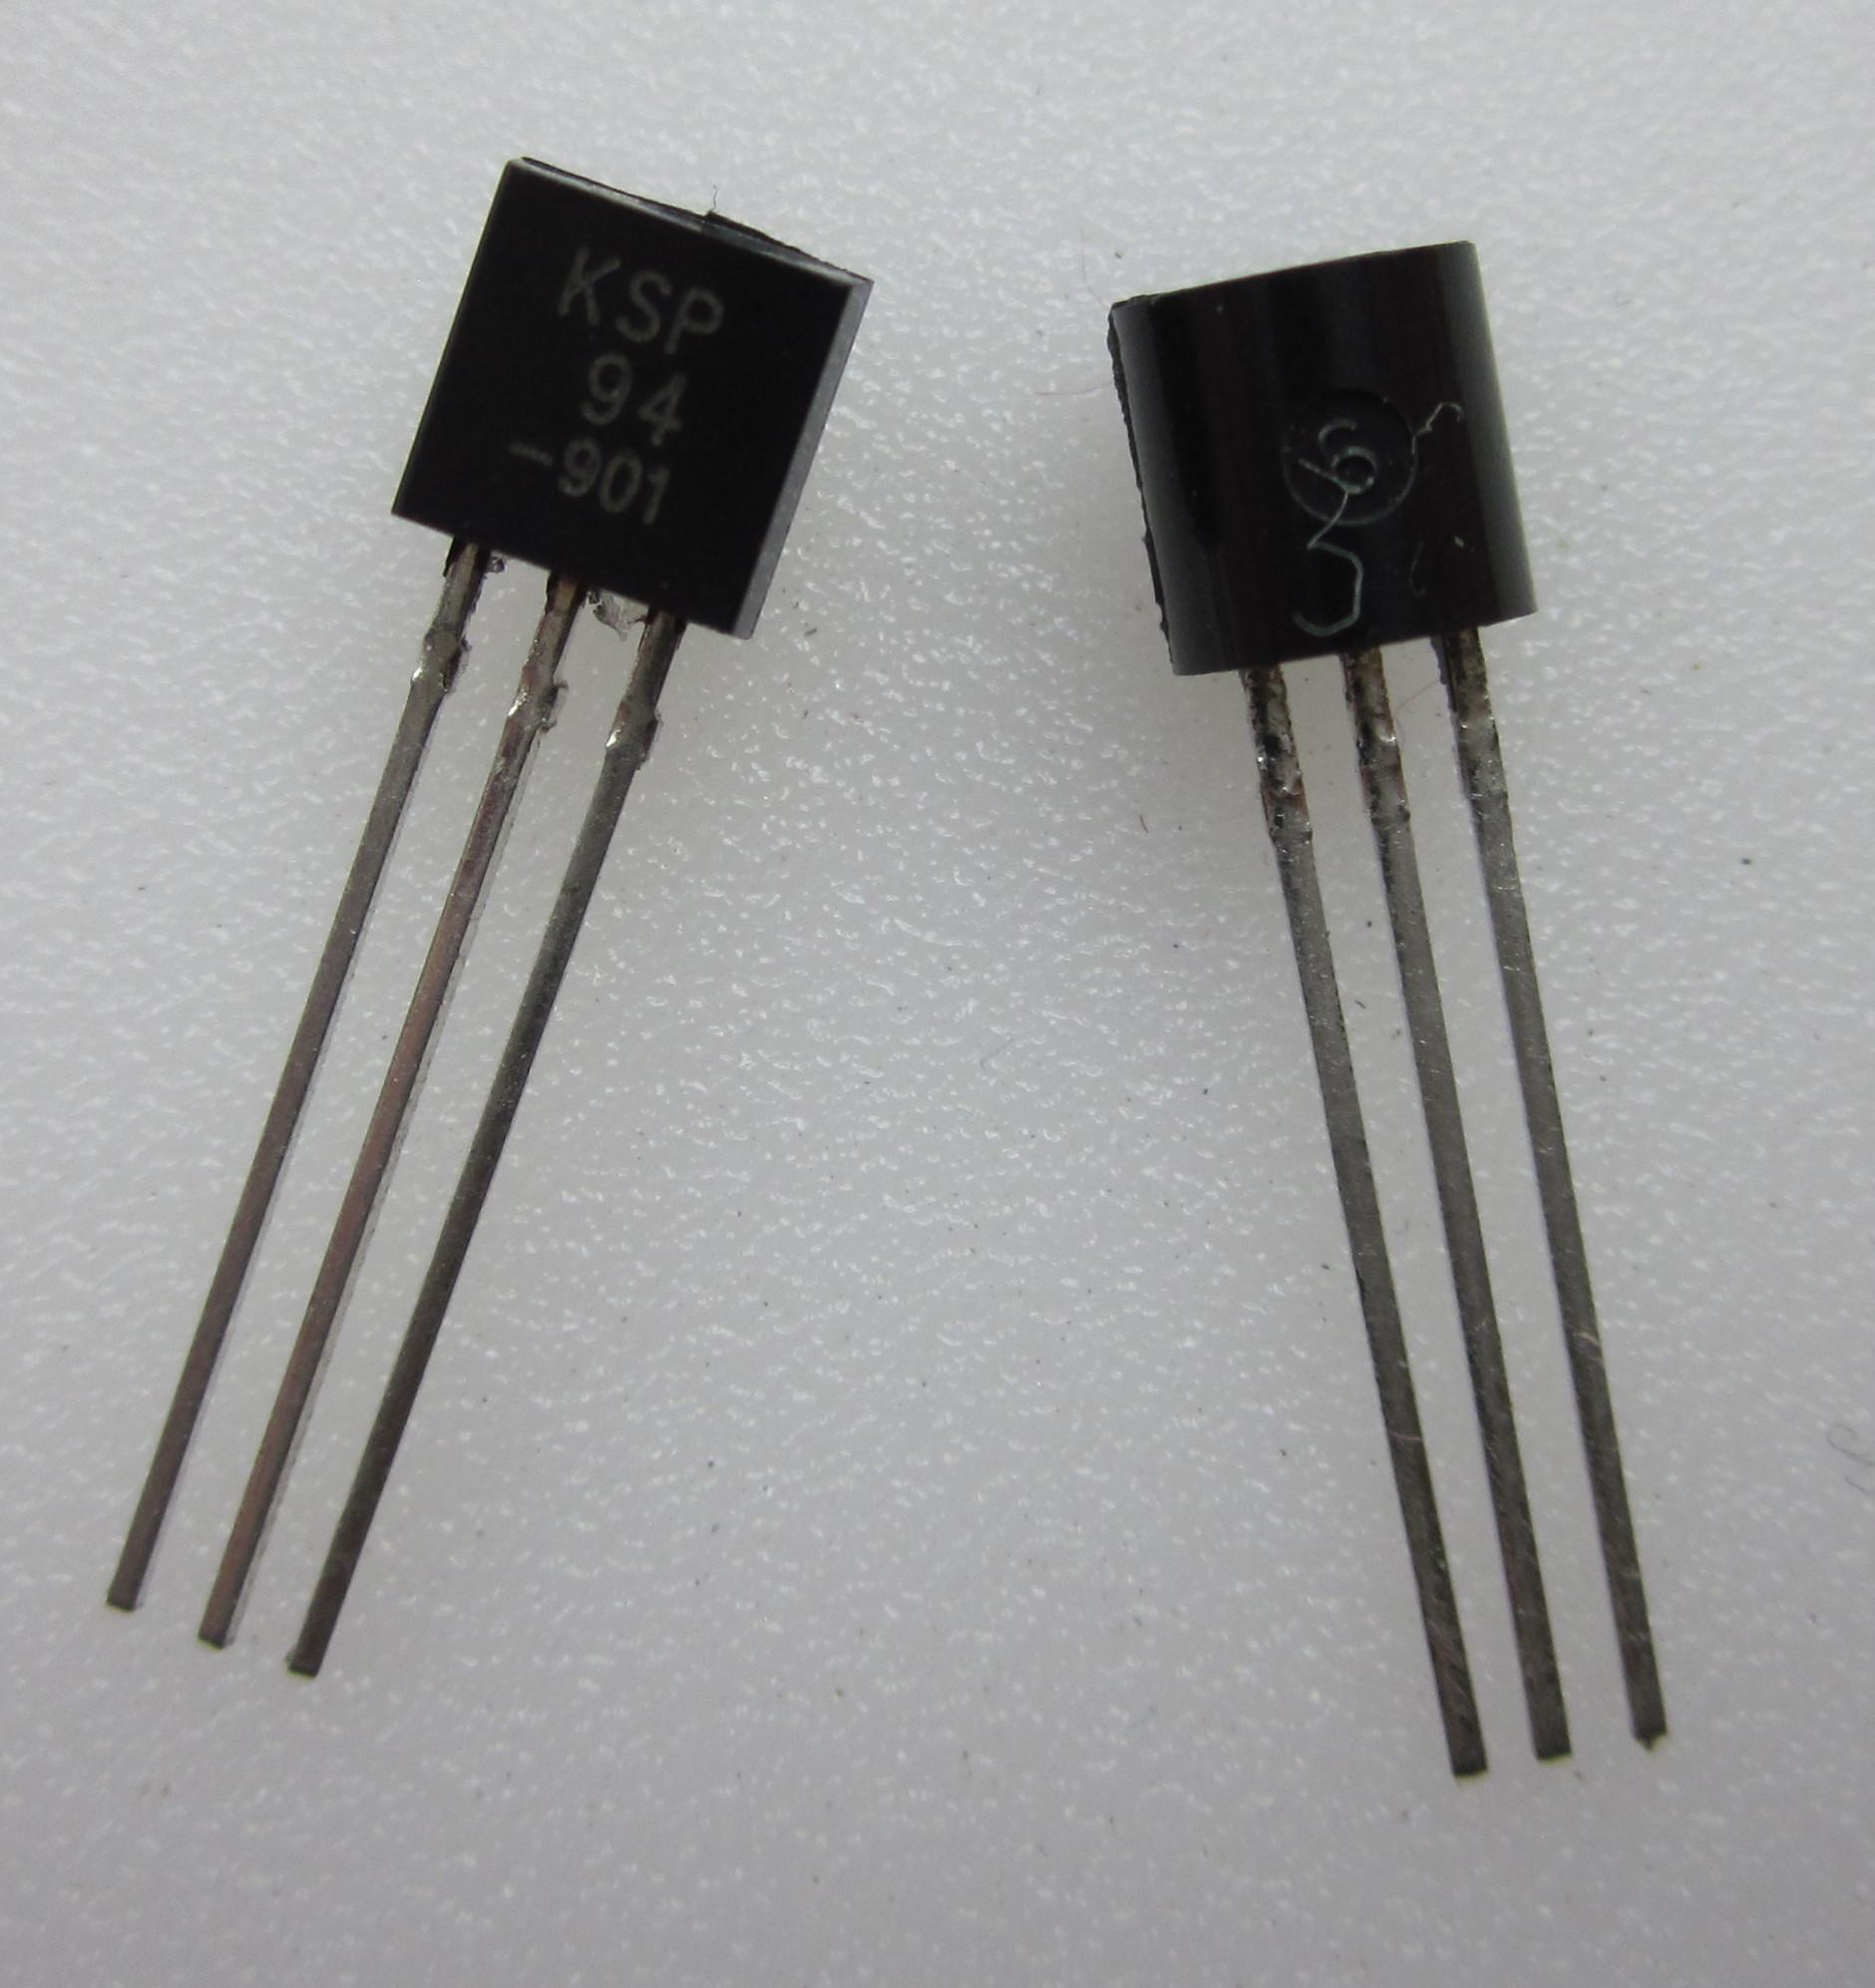 MPSA94 (KSP94) TO92